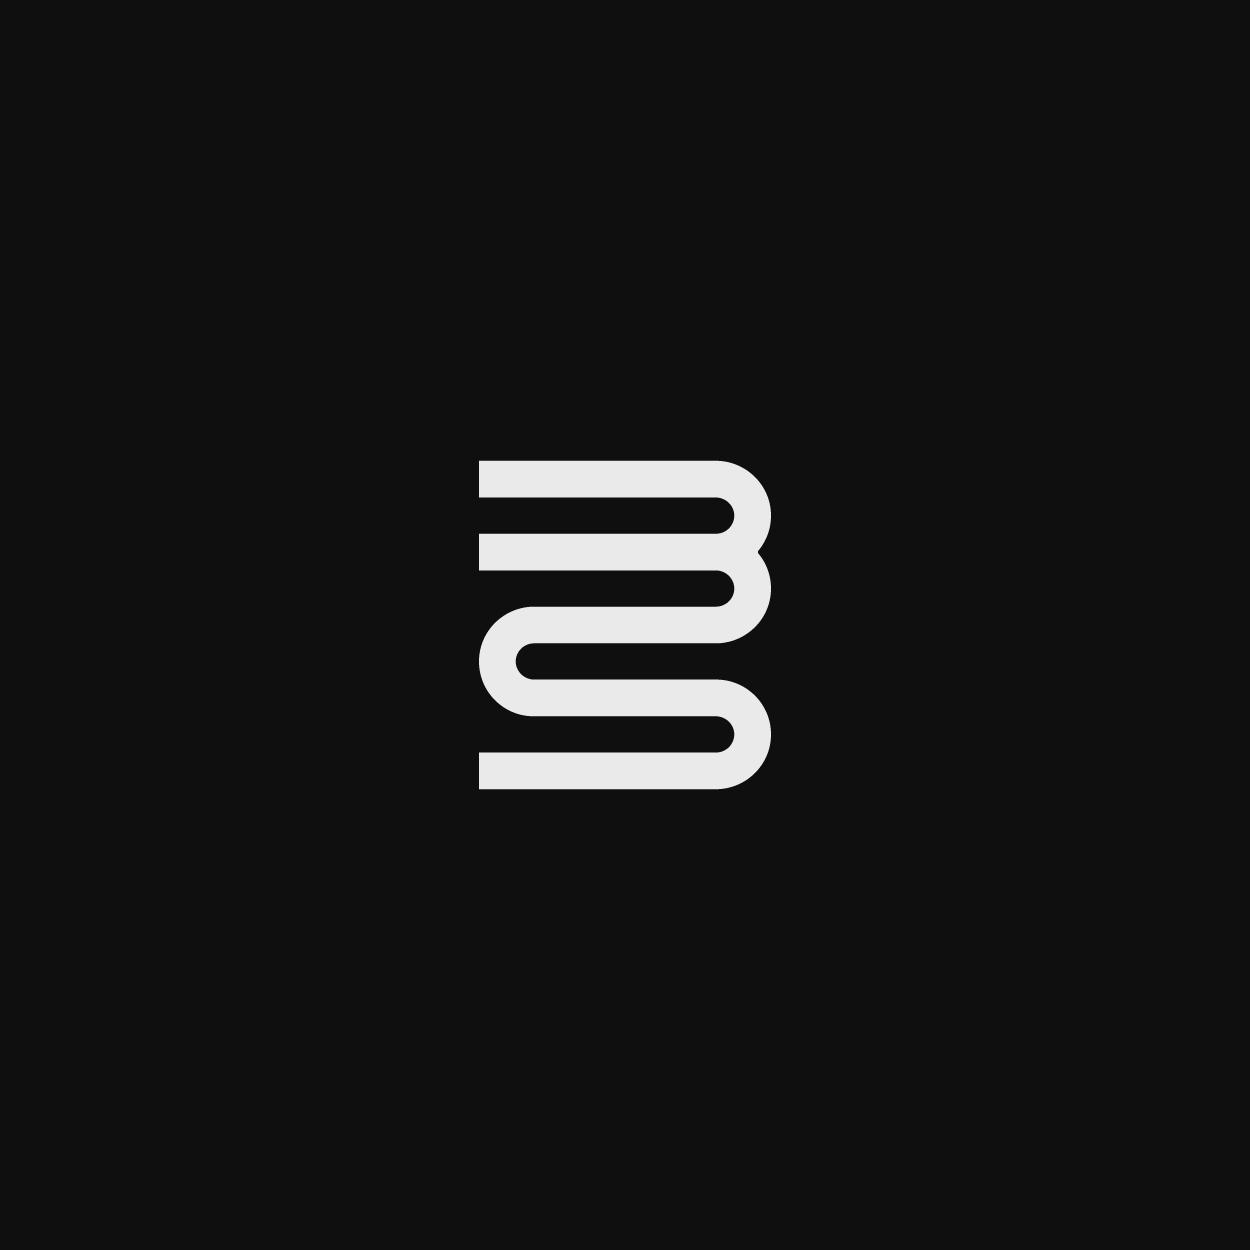 Sylvan_Logofolio2019_Artboard 2211250.jpg